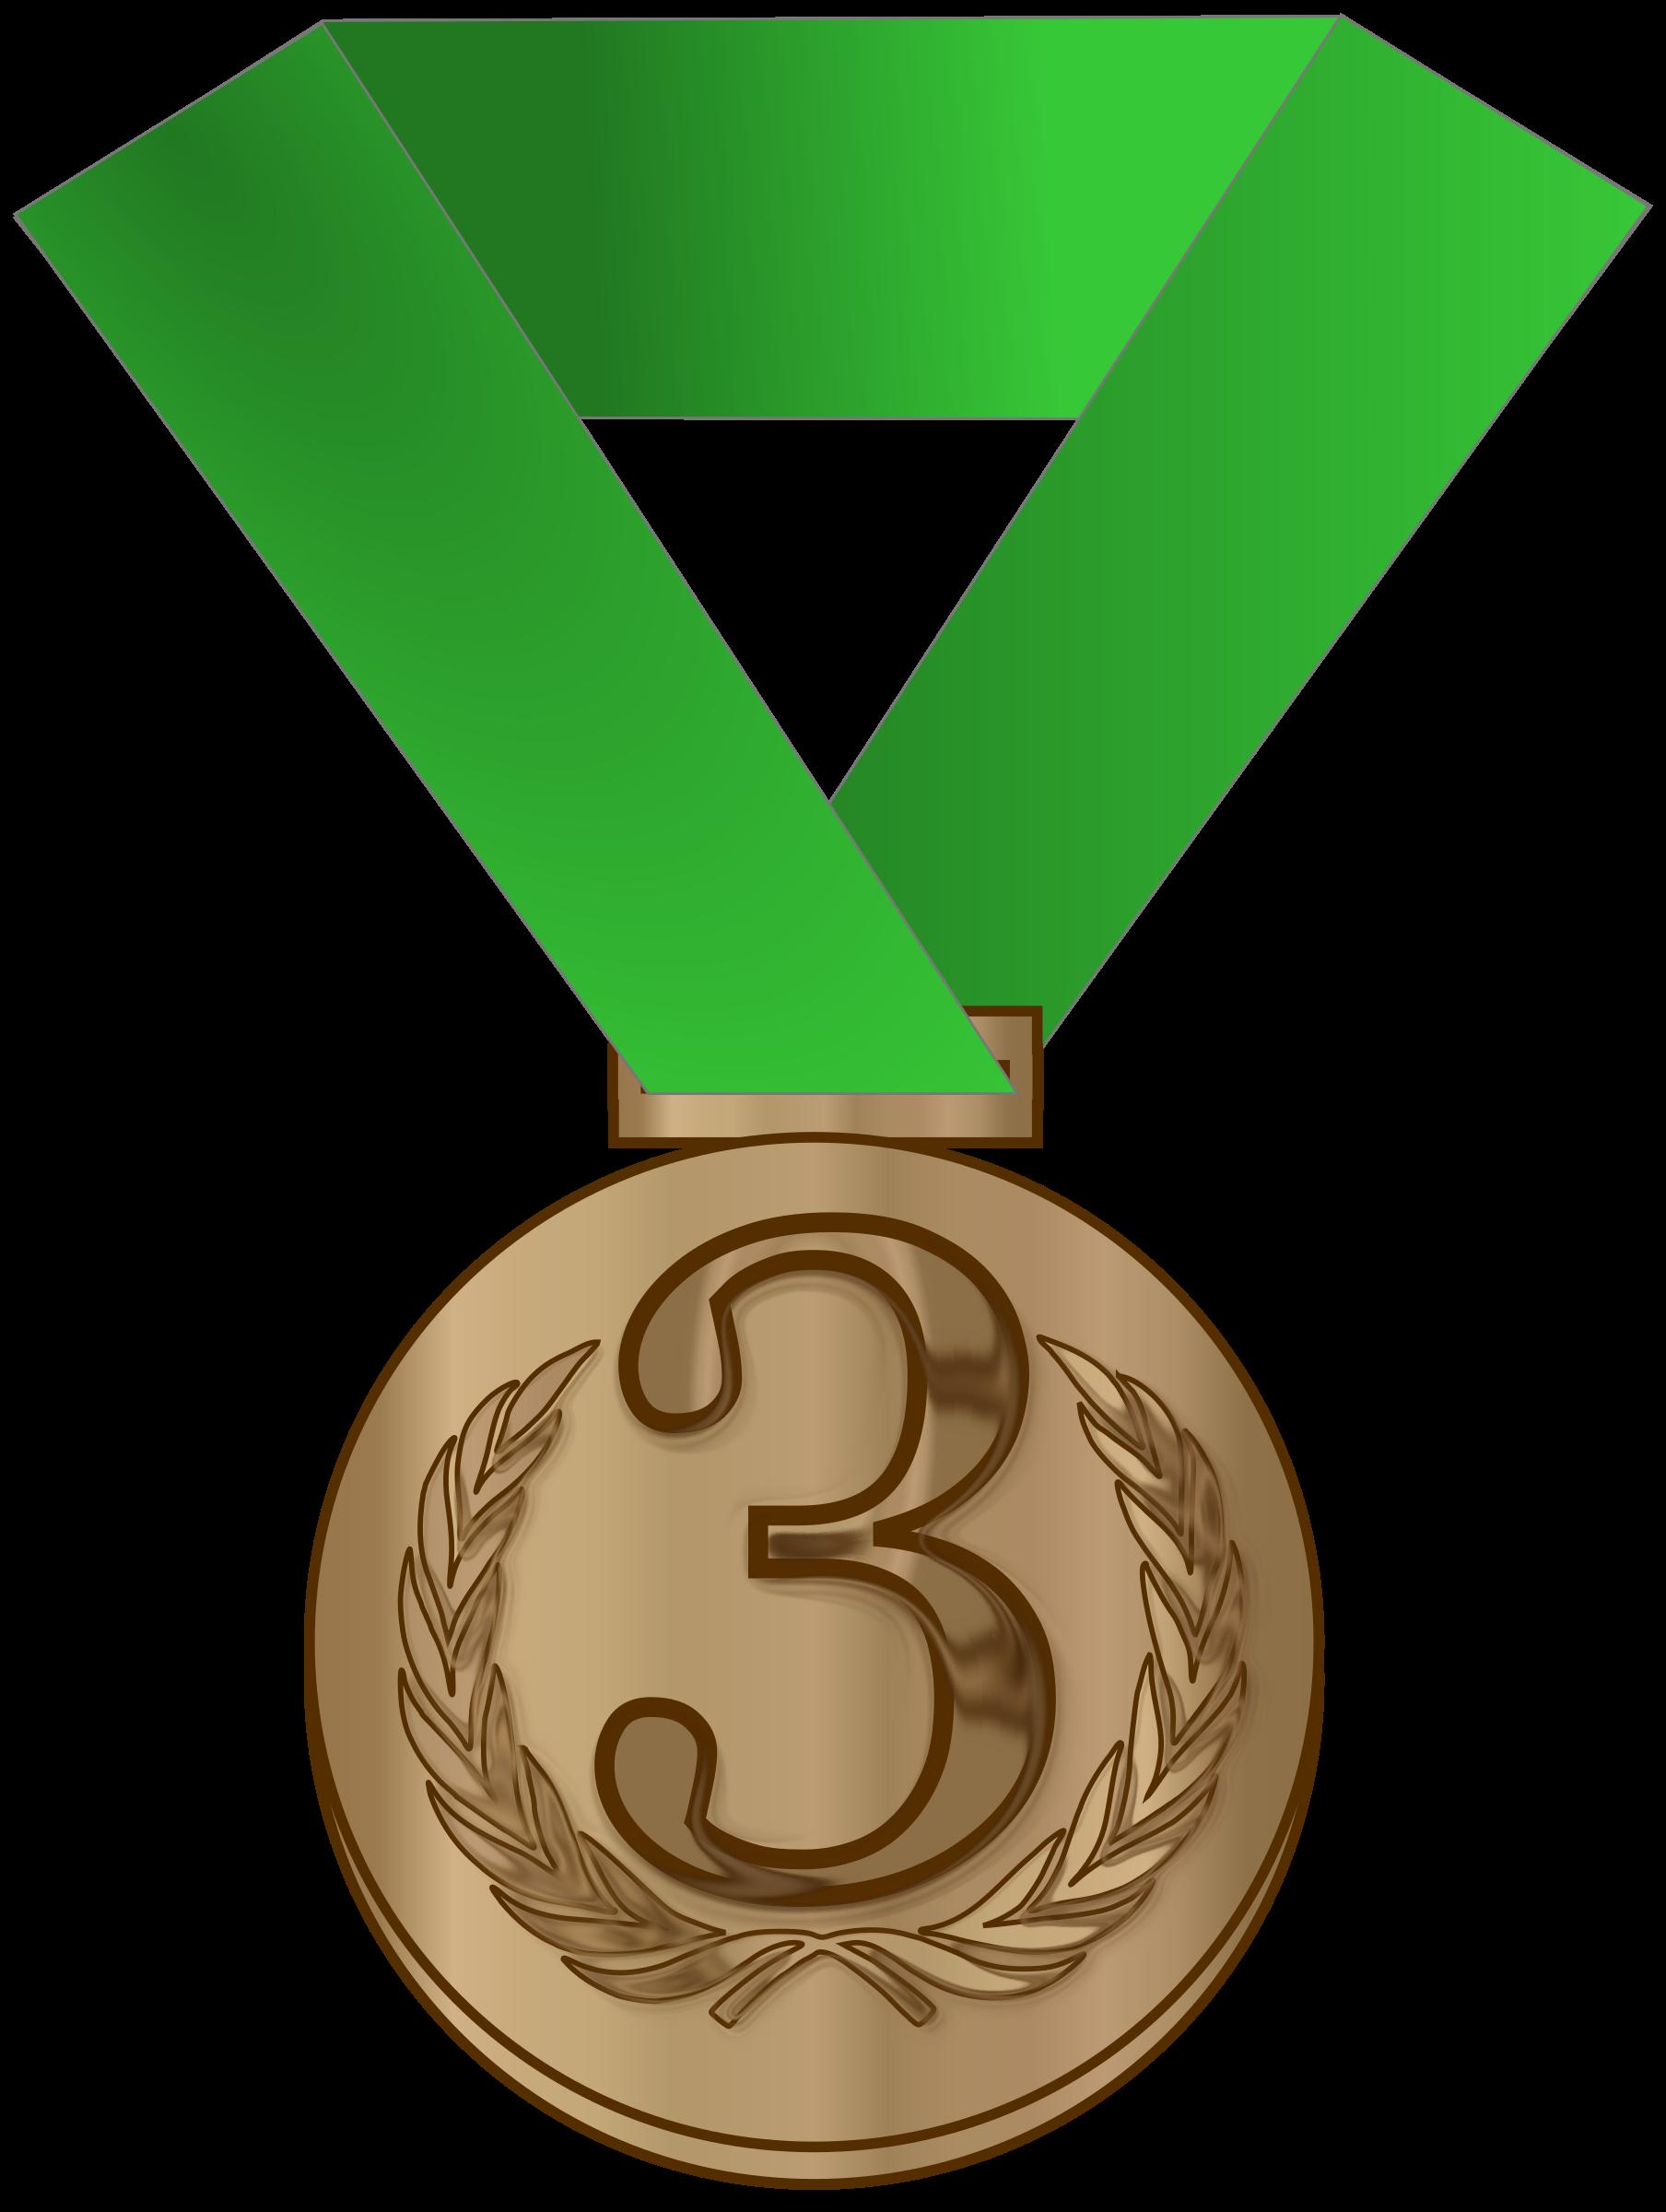 vector royalty free download Award big image png. Medal clipart bronze.